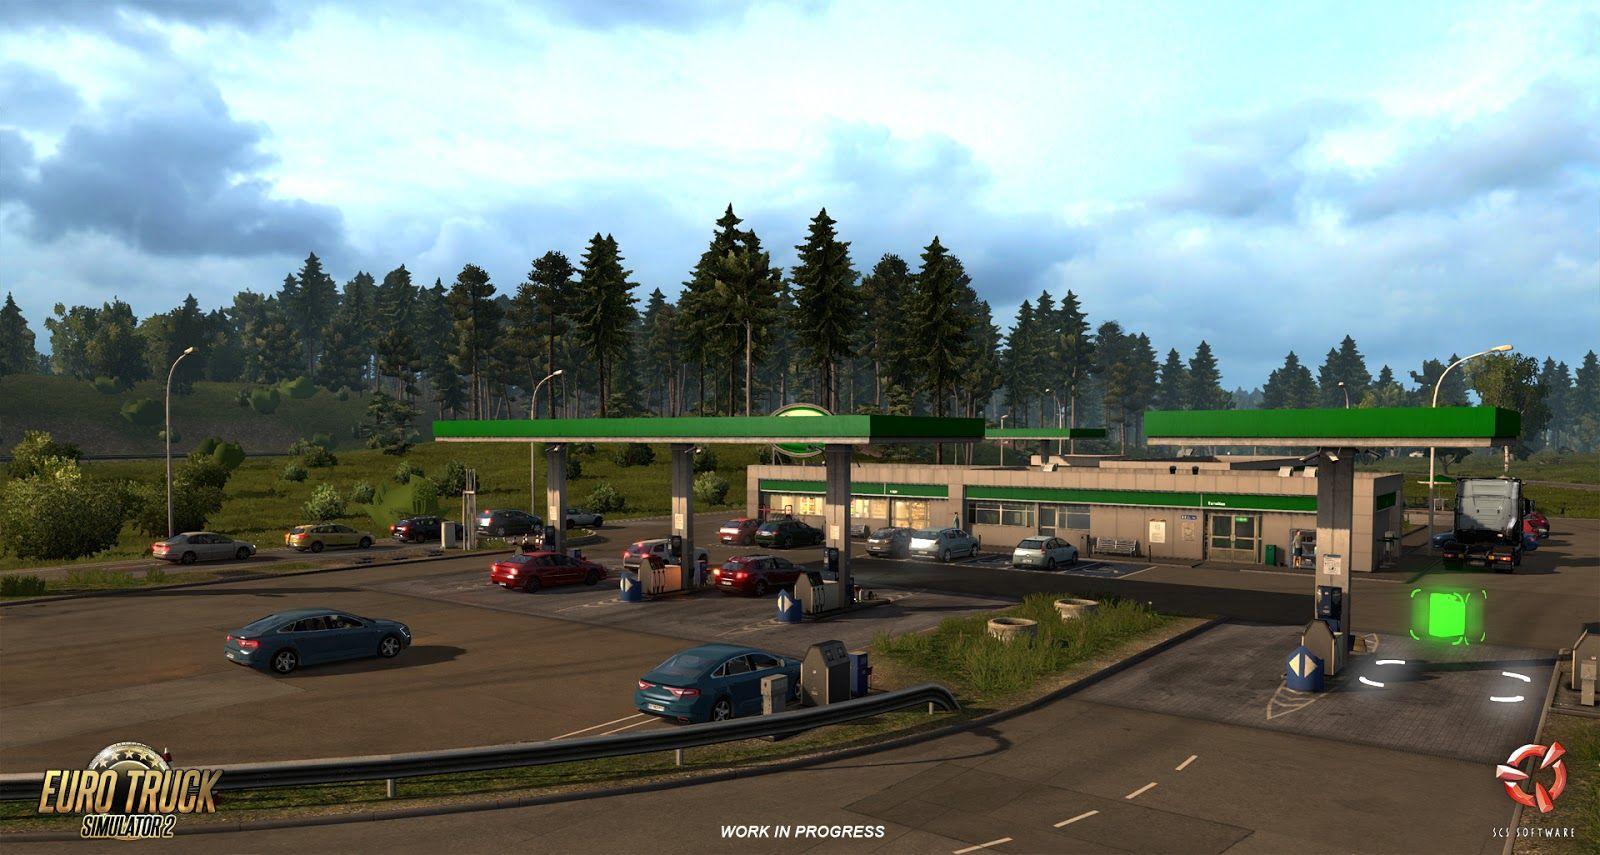 Euro Truck Simulator 2: небольшой взгляд на Францию